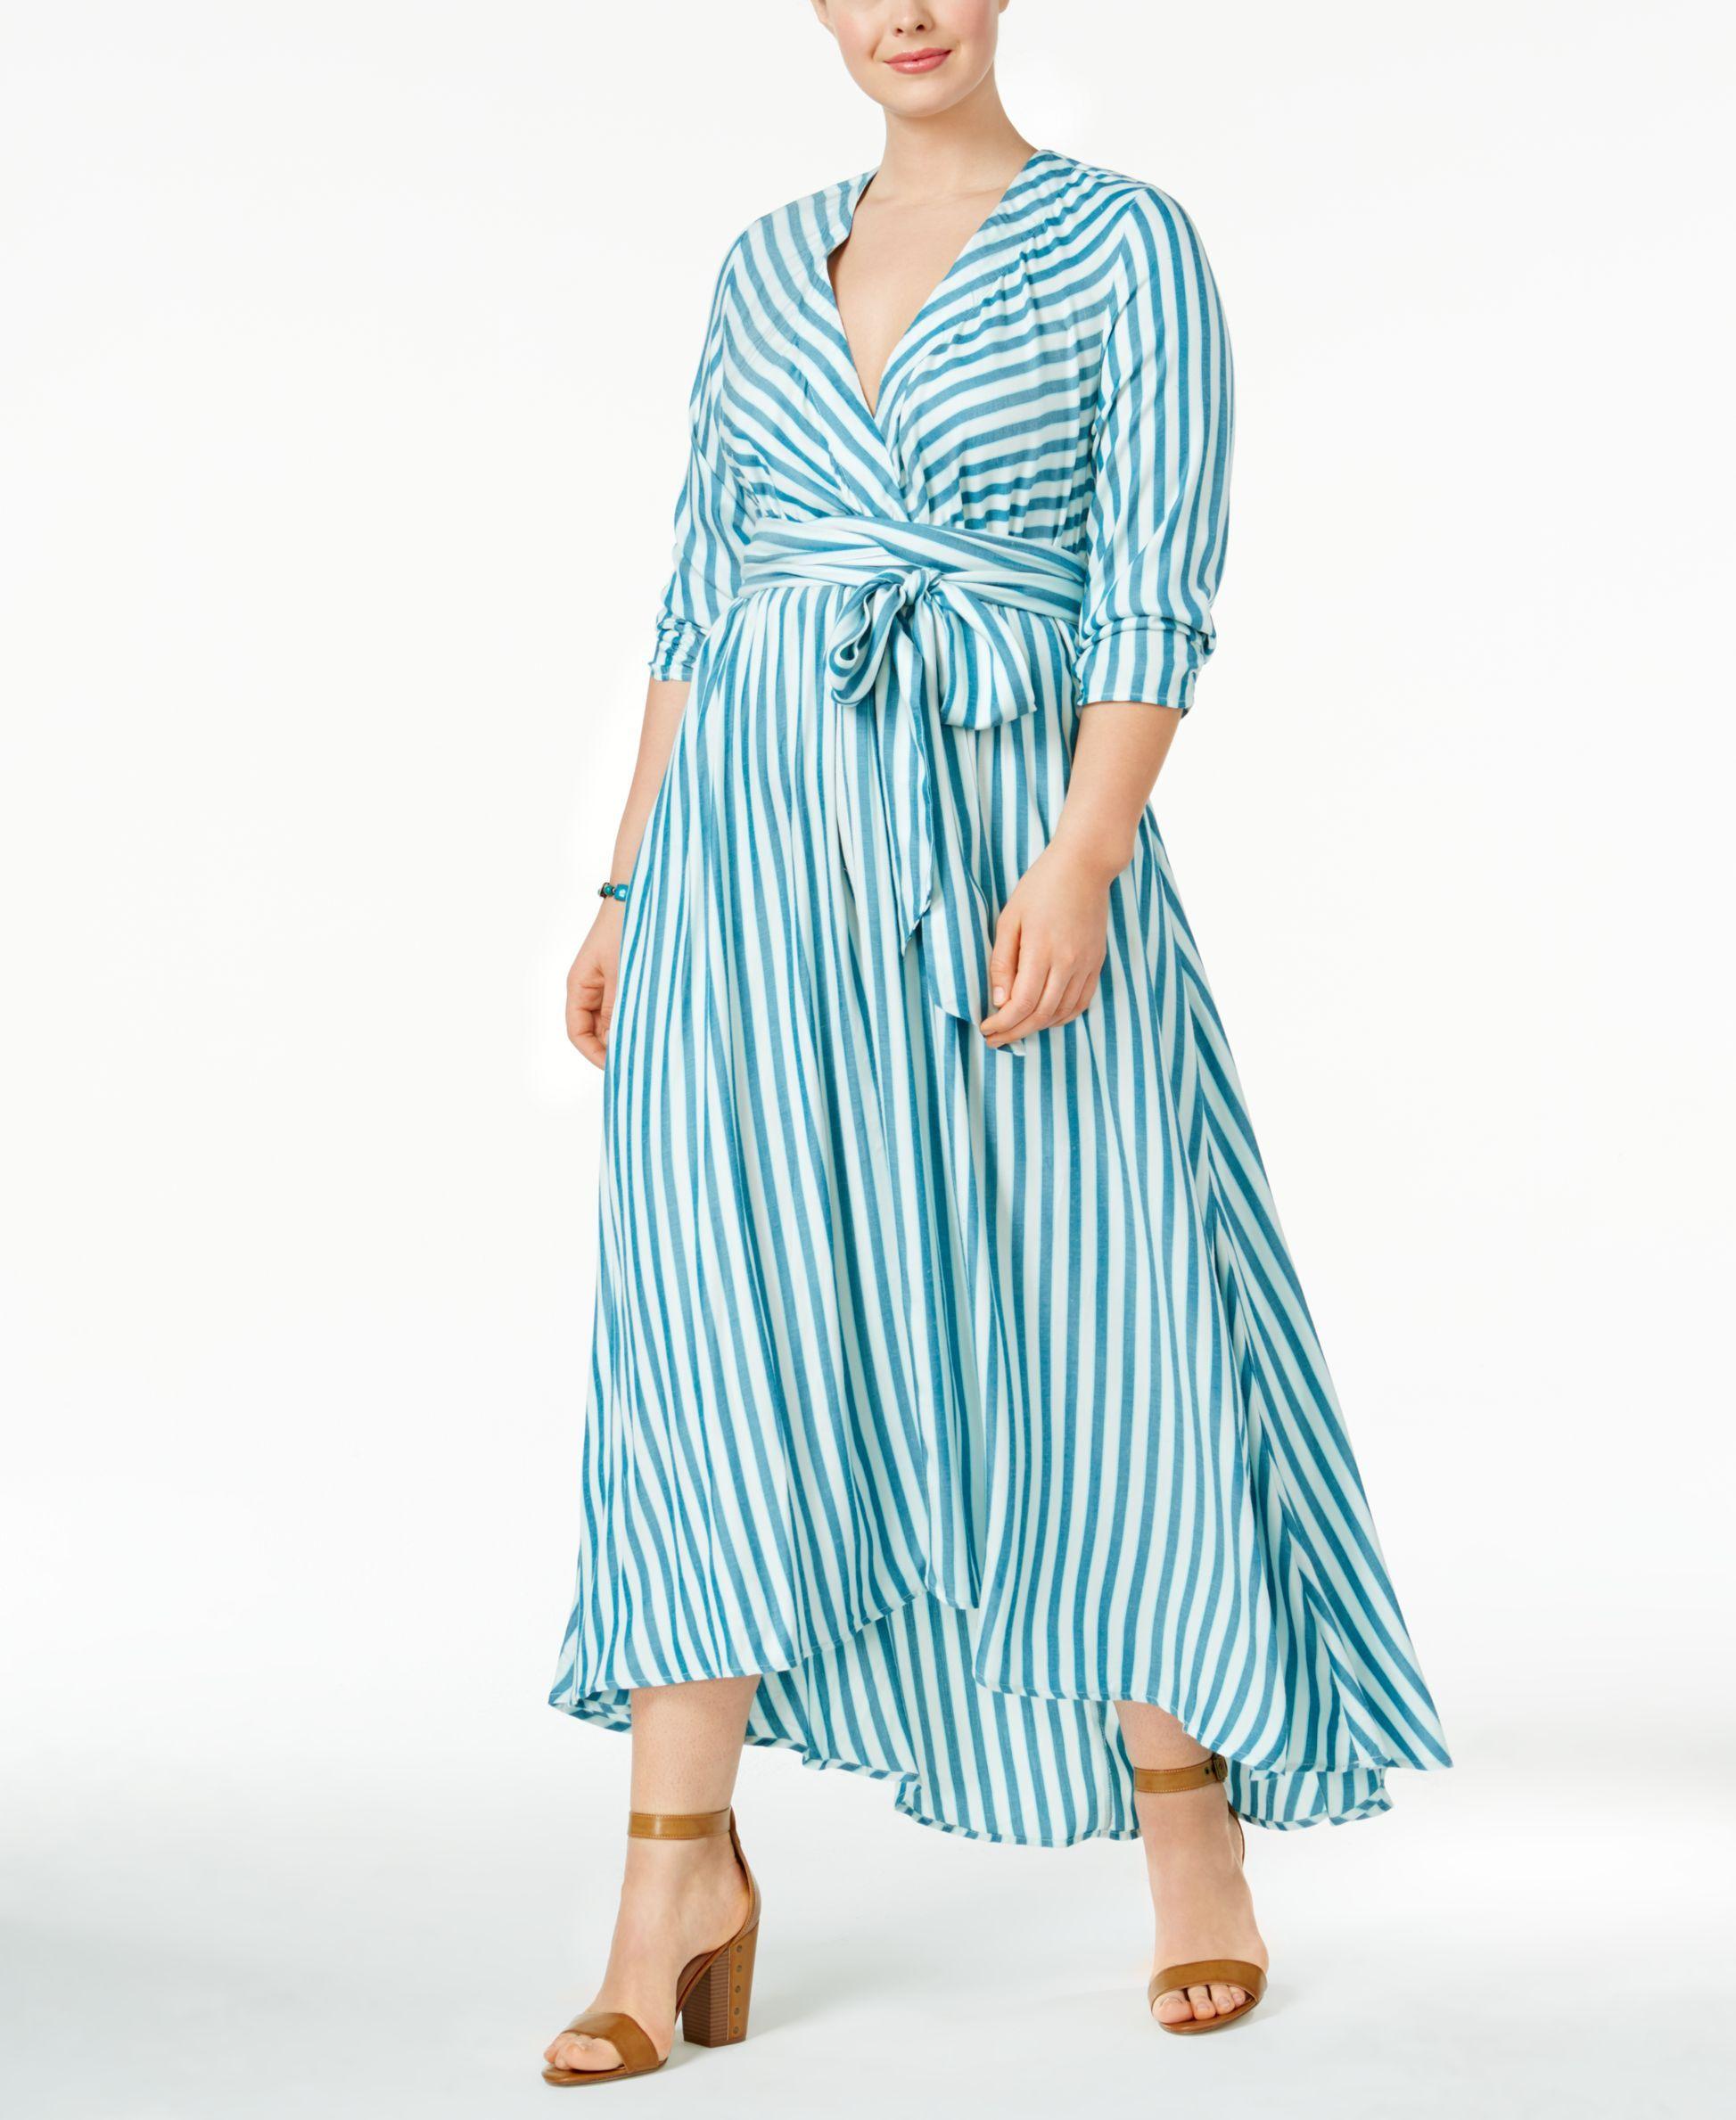 abd7b1f4651 Melissa McCarthy Seven7 Trendy Plus Size Faux-Wrap Maxi Dress ...